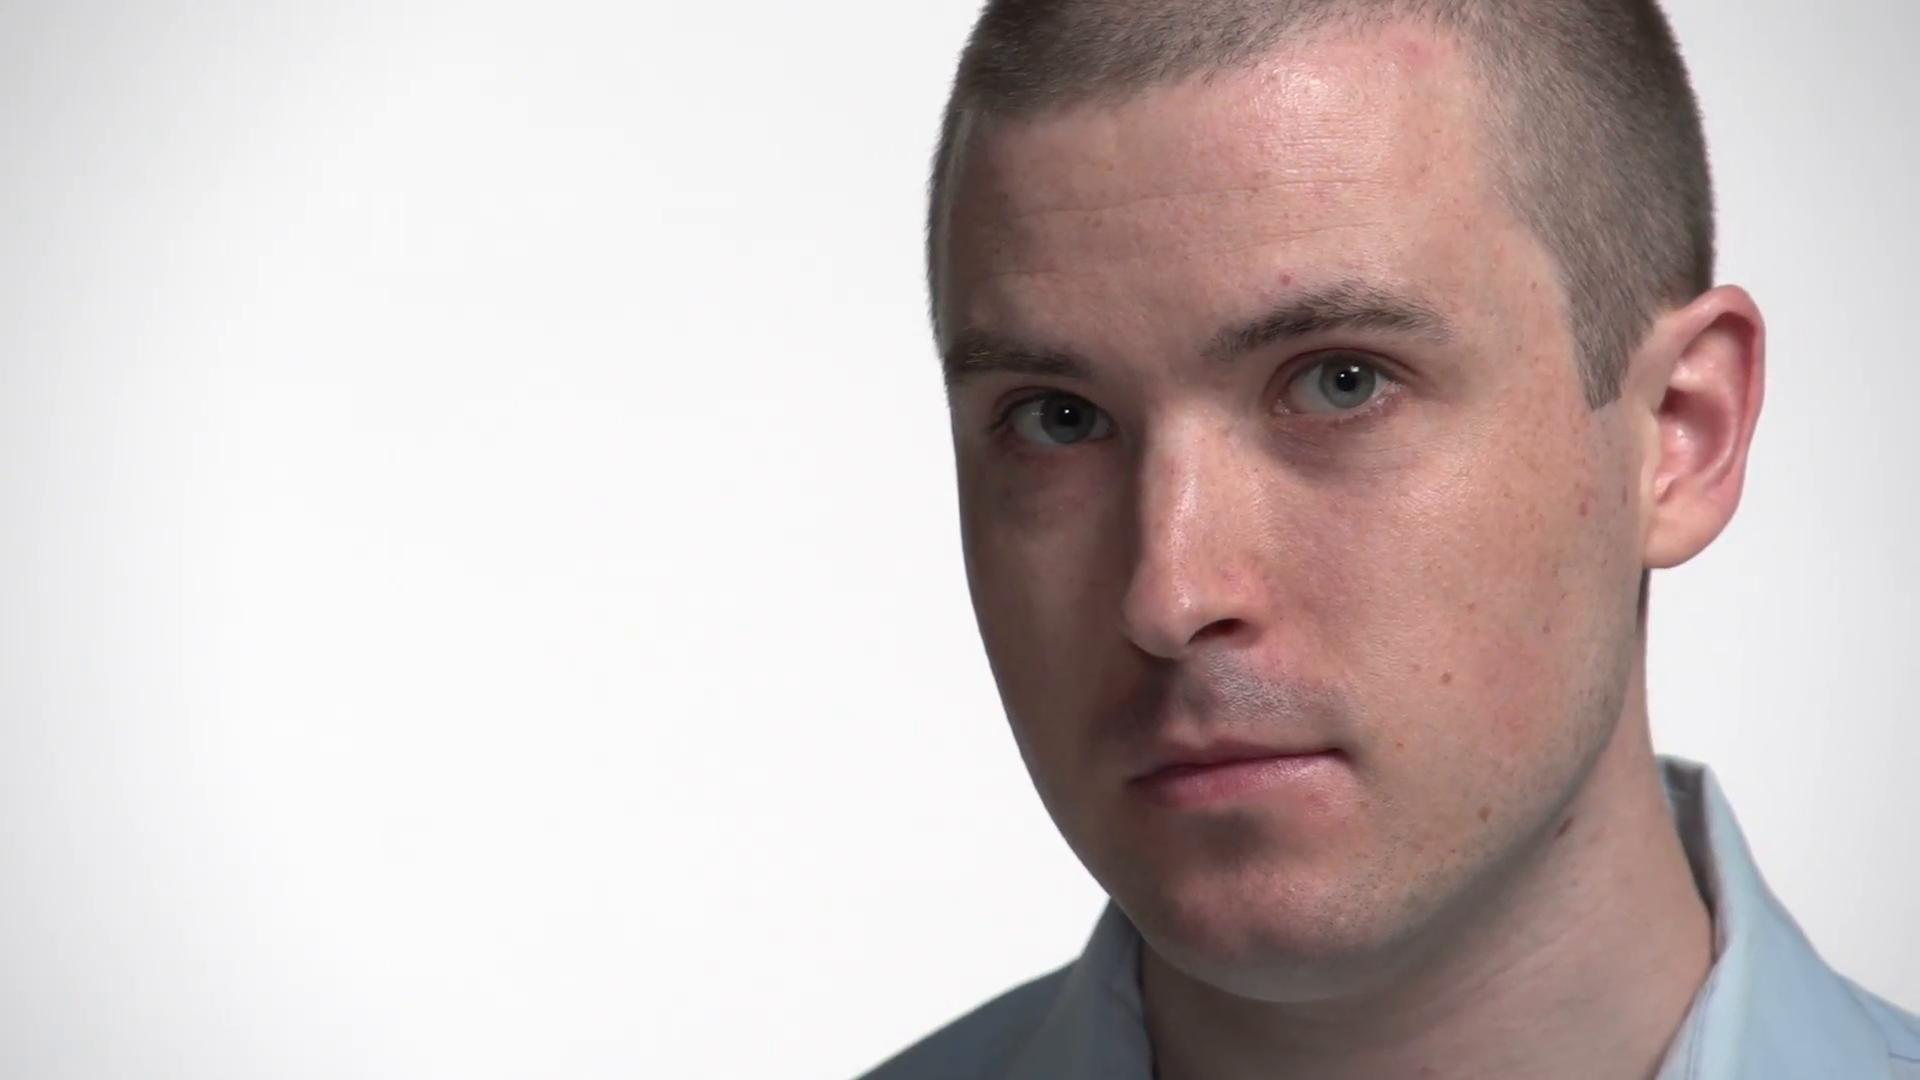 Caucasian man's face on white, smiling Stock Video Footage - Videoblocks